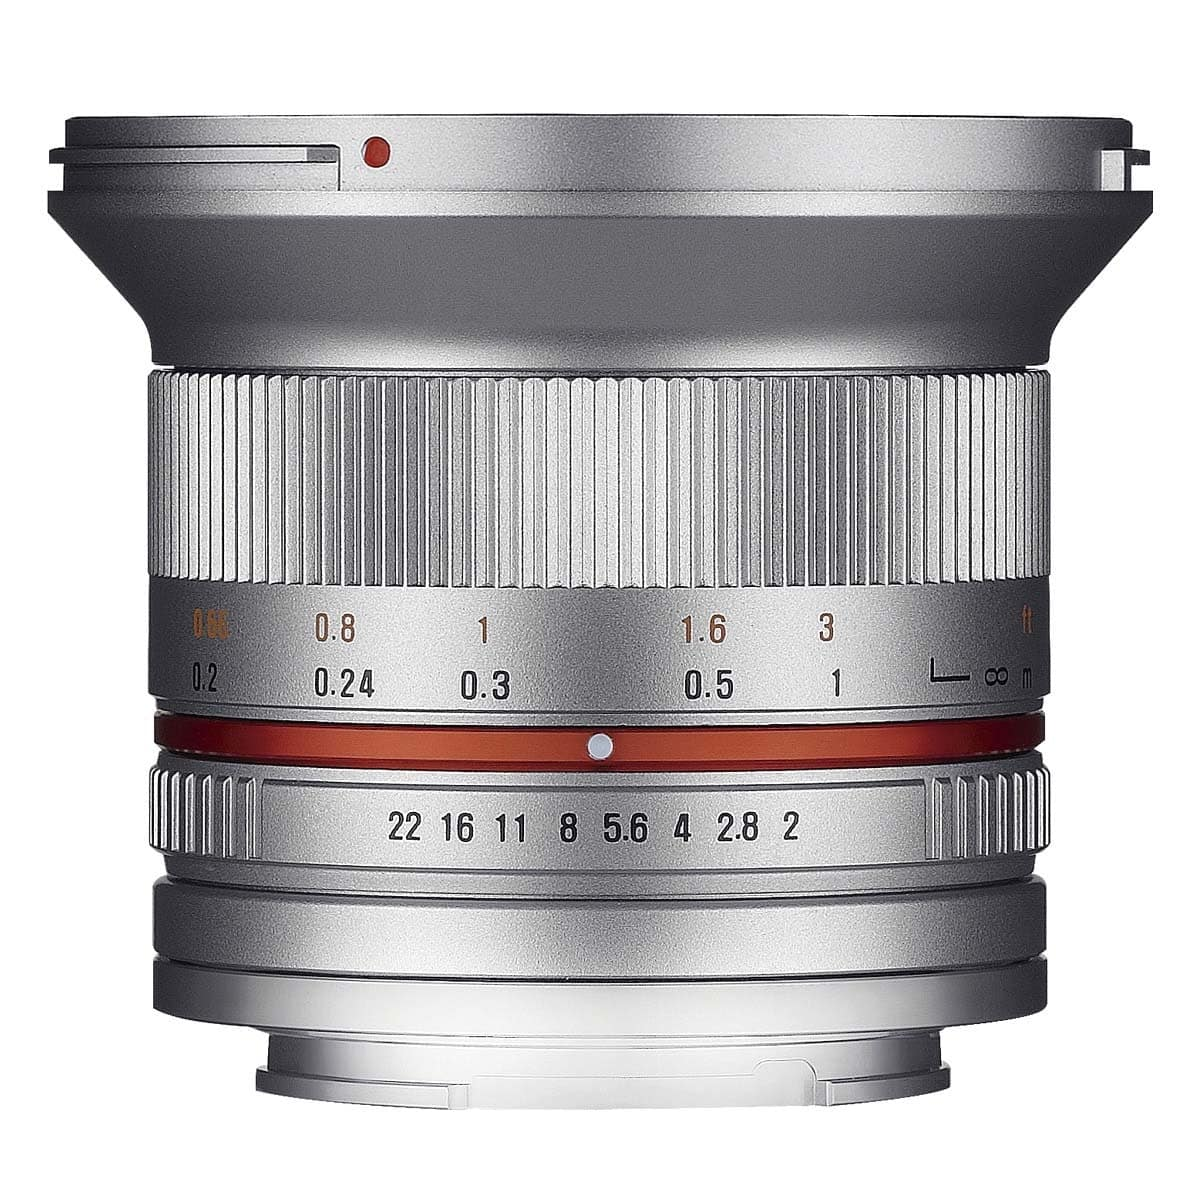 Objetivo Samyang 12 mm F2.0 NCS CS para montura Sony tipo E